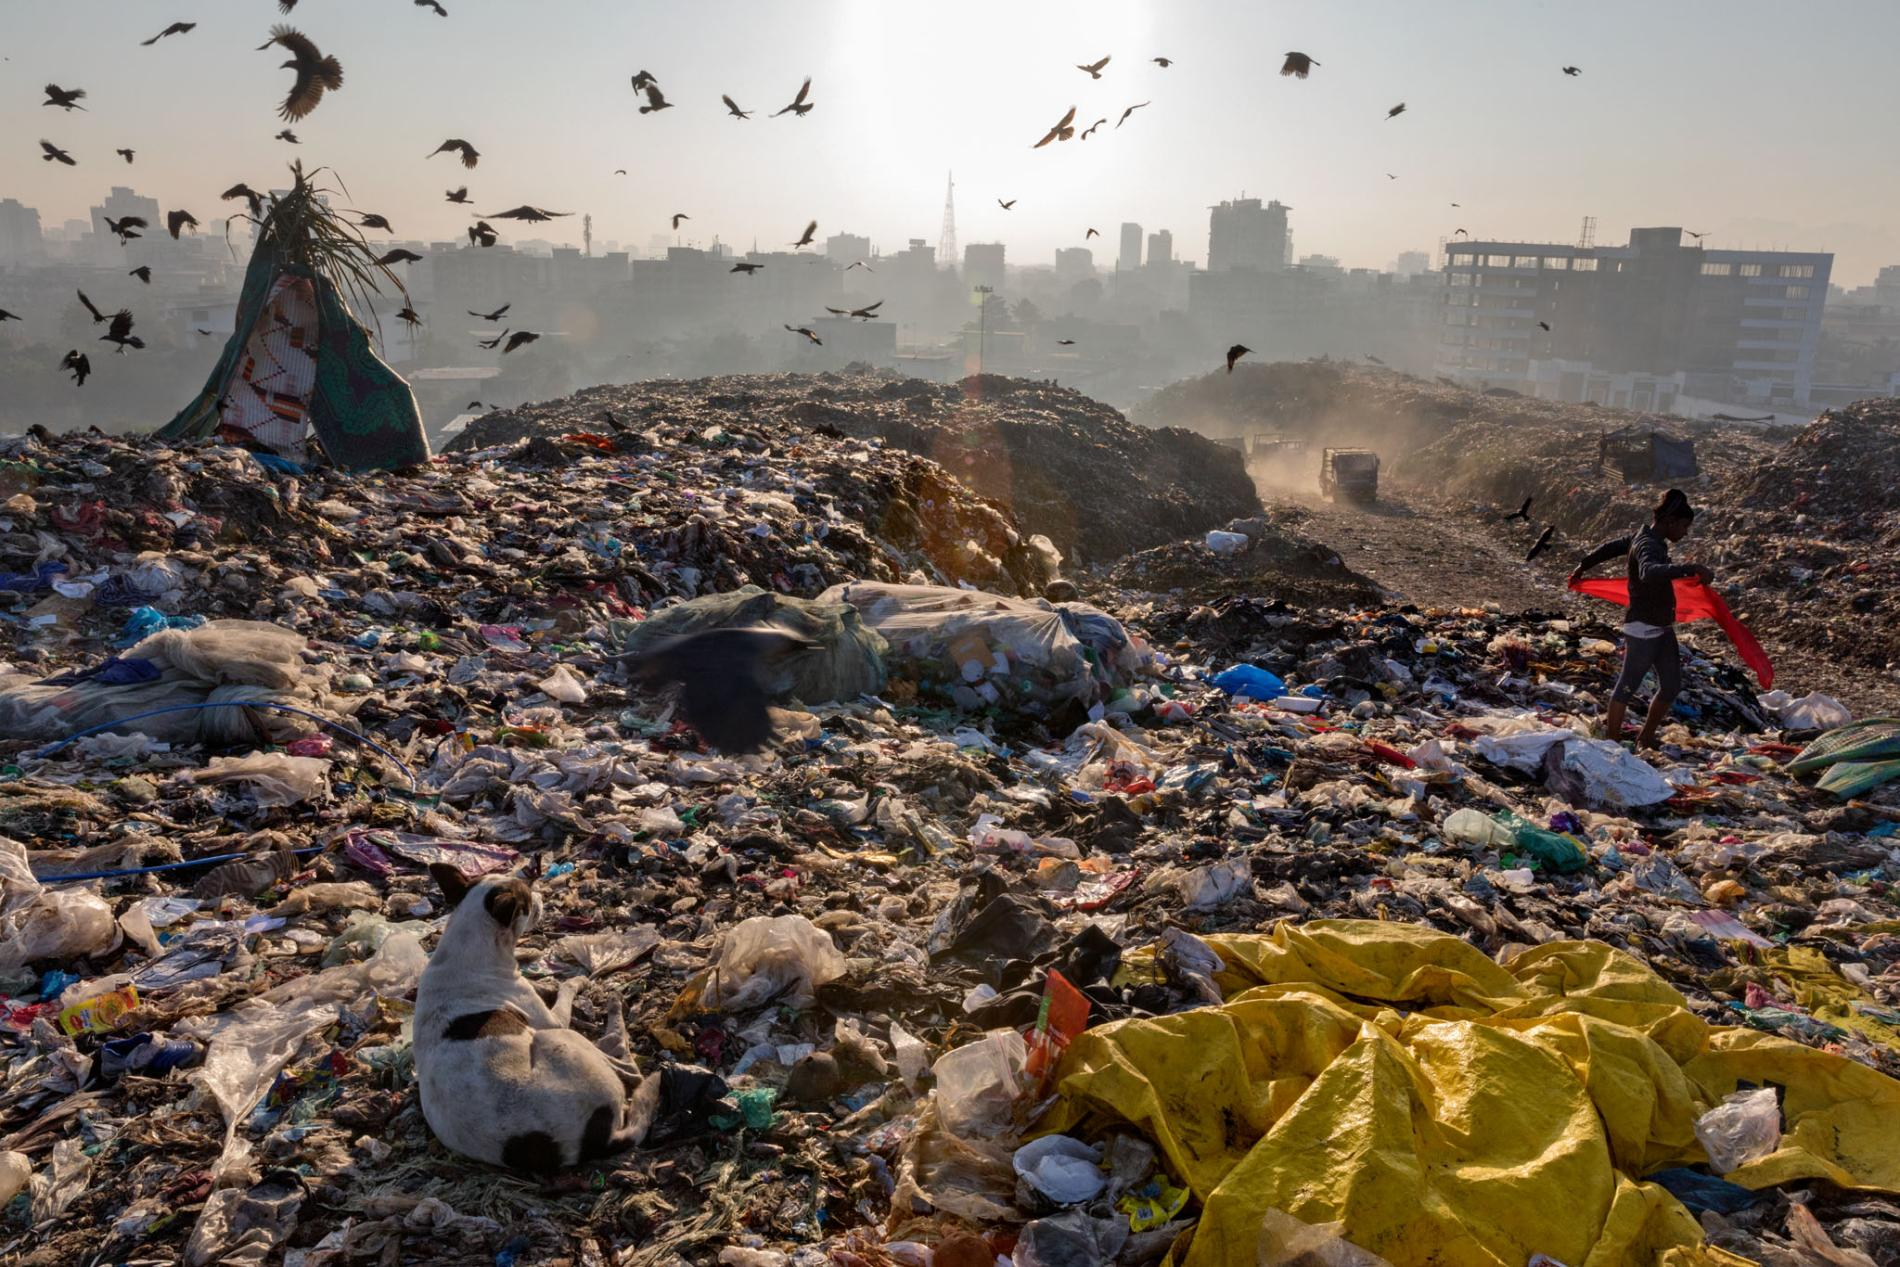 plastic-waste-single-use-worldwide-consumption-7.adapt.1900.1.jpg